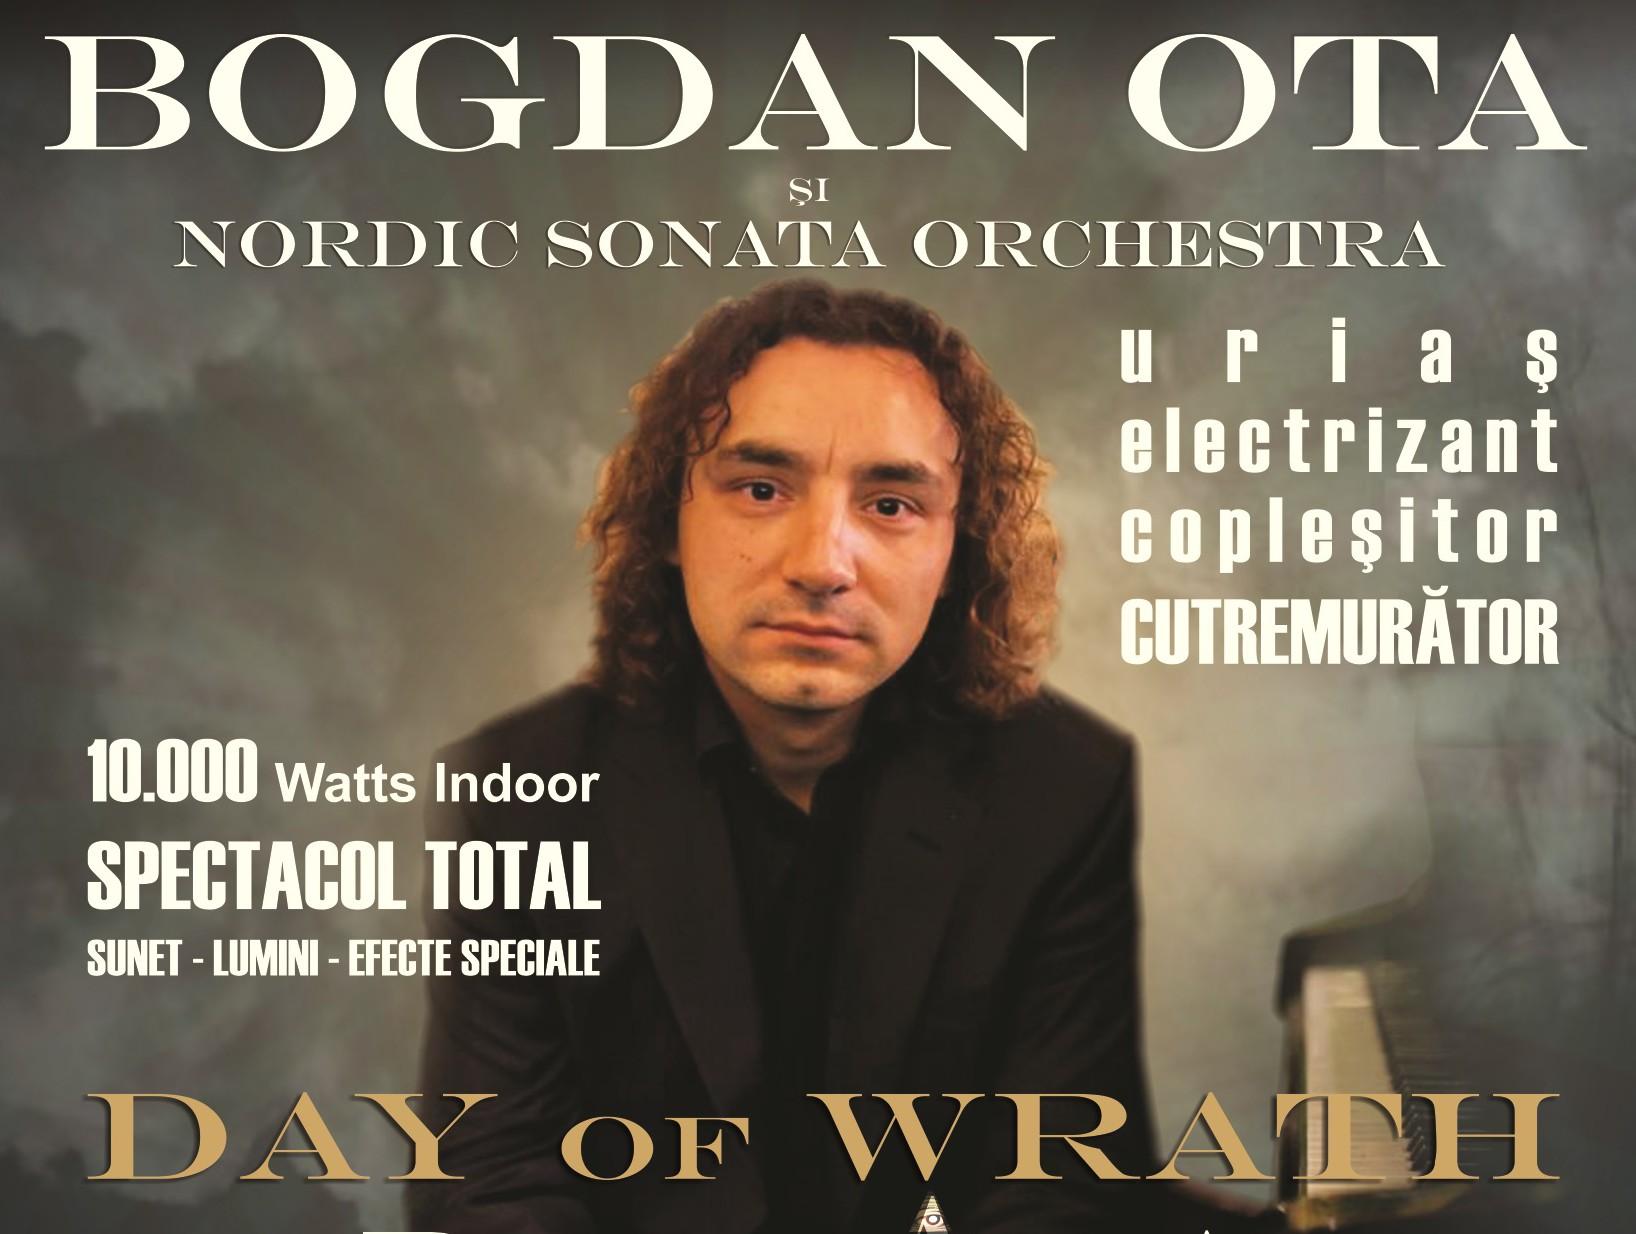 Bogdan Ota în concert la Cinema Patria